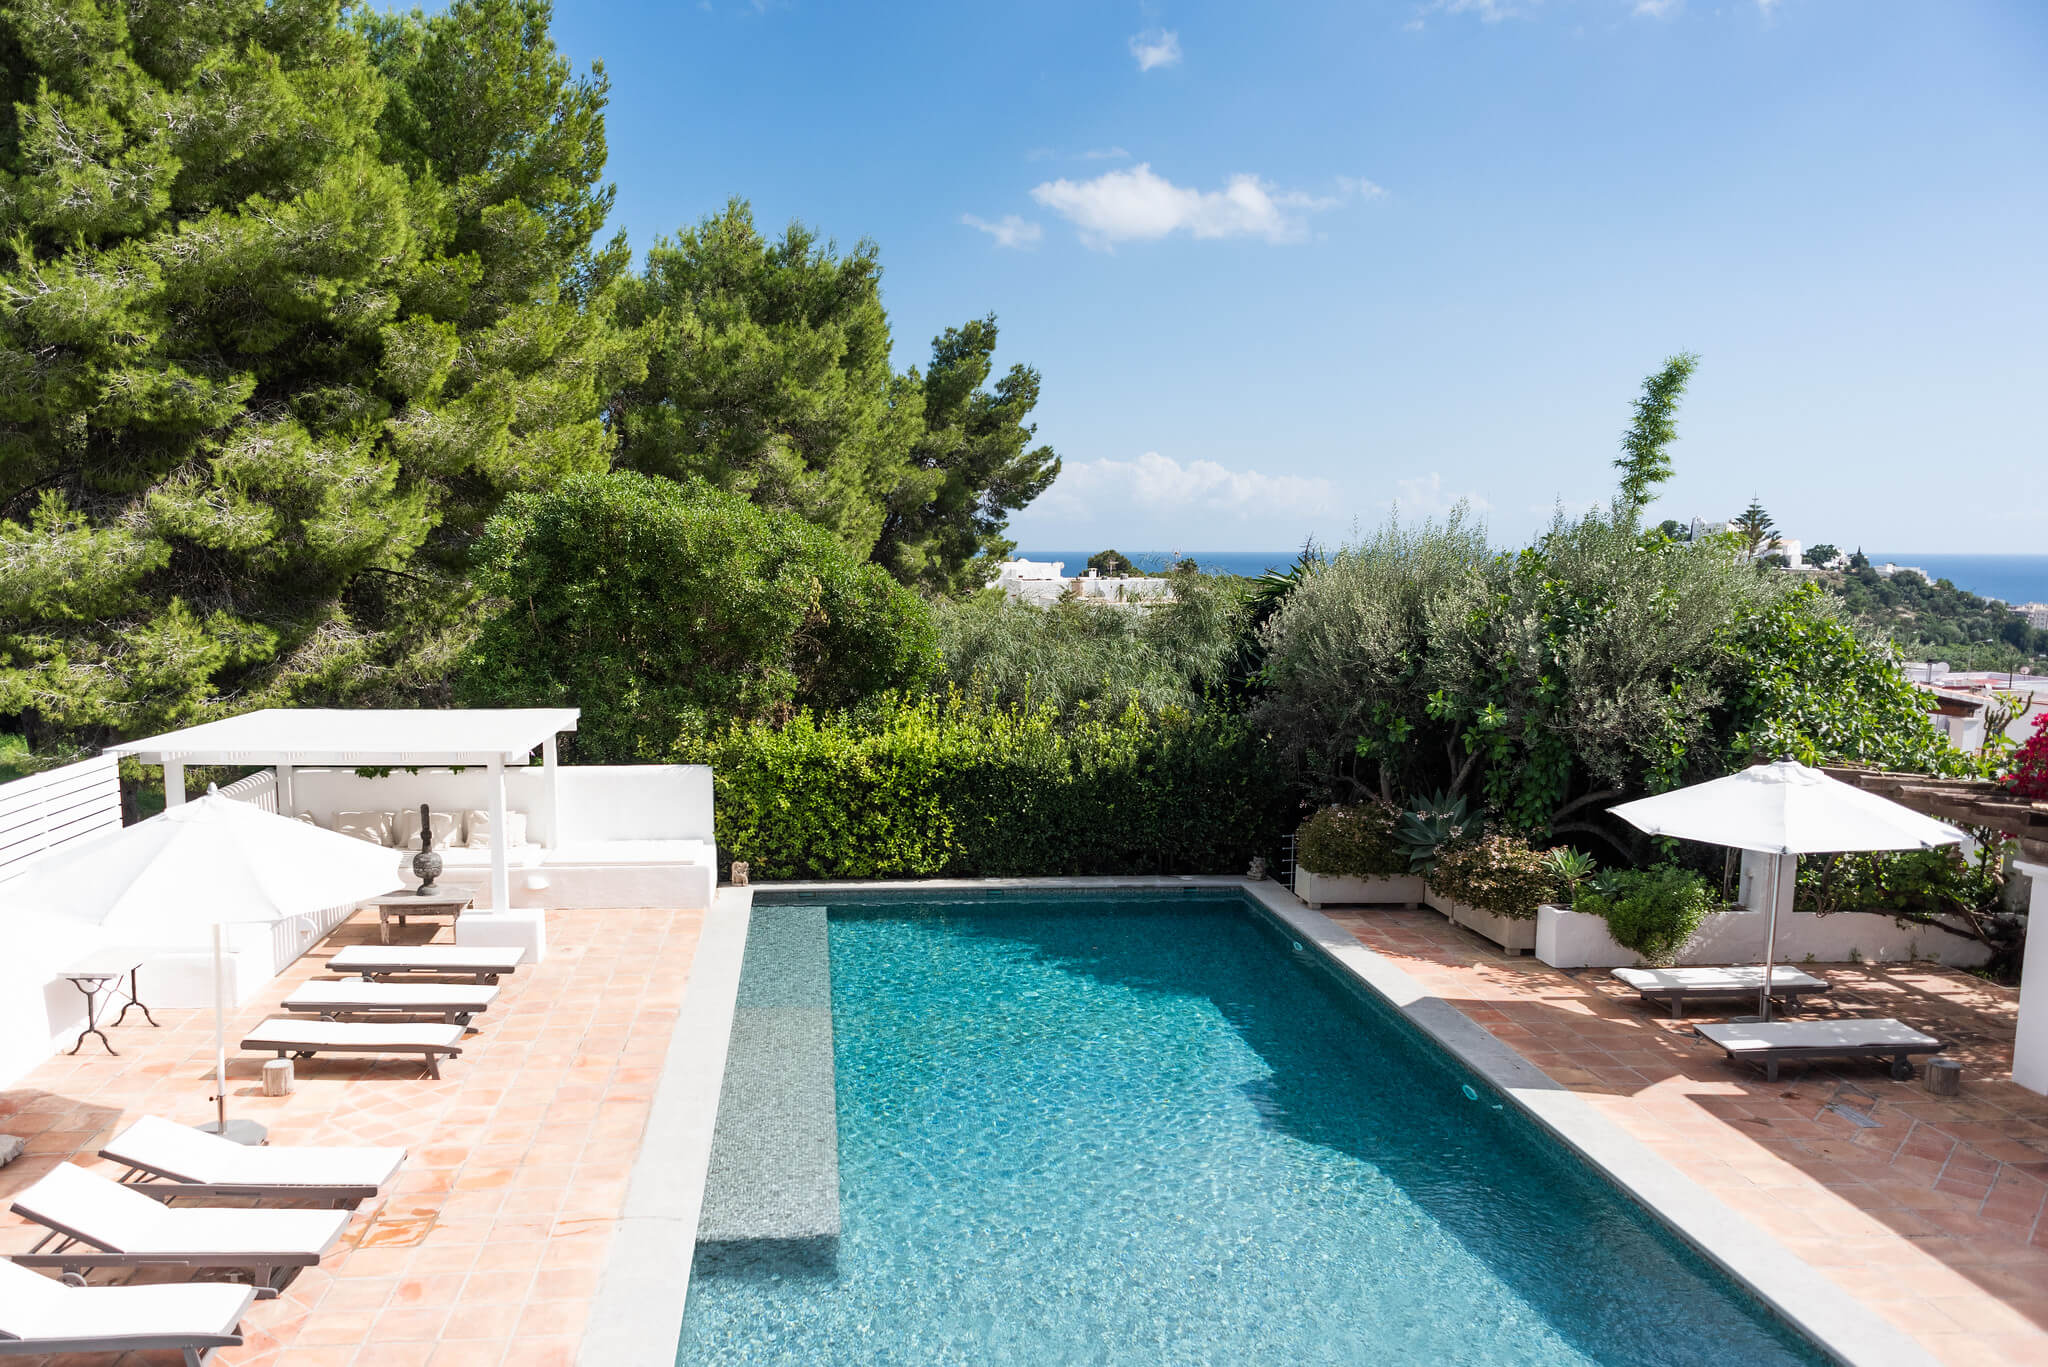 https://www.white-ibiza.com/wp-content/uploads/2020/05/white-ibiza-villas-can-lyra-pool-views.jpg